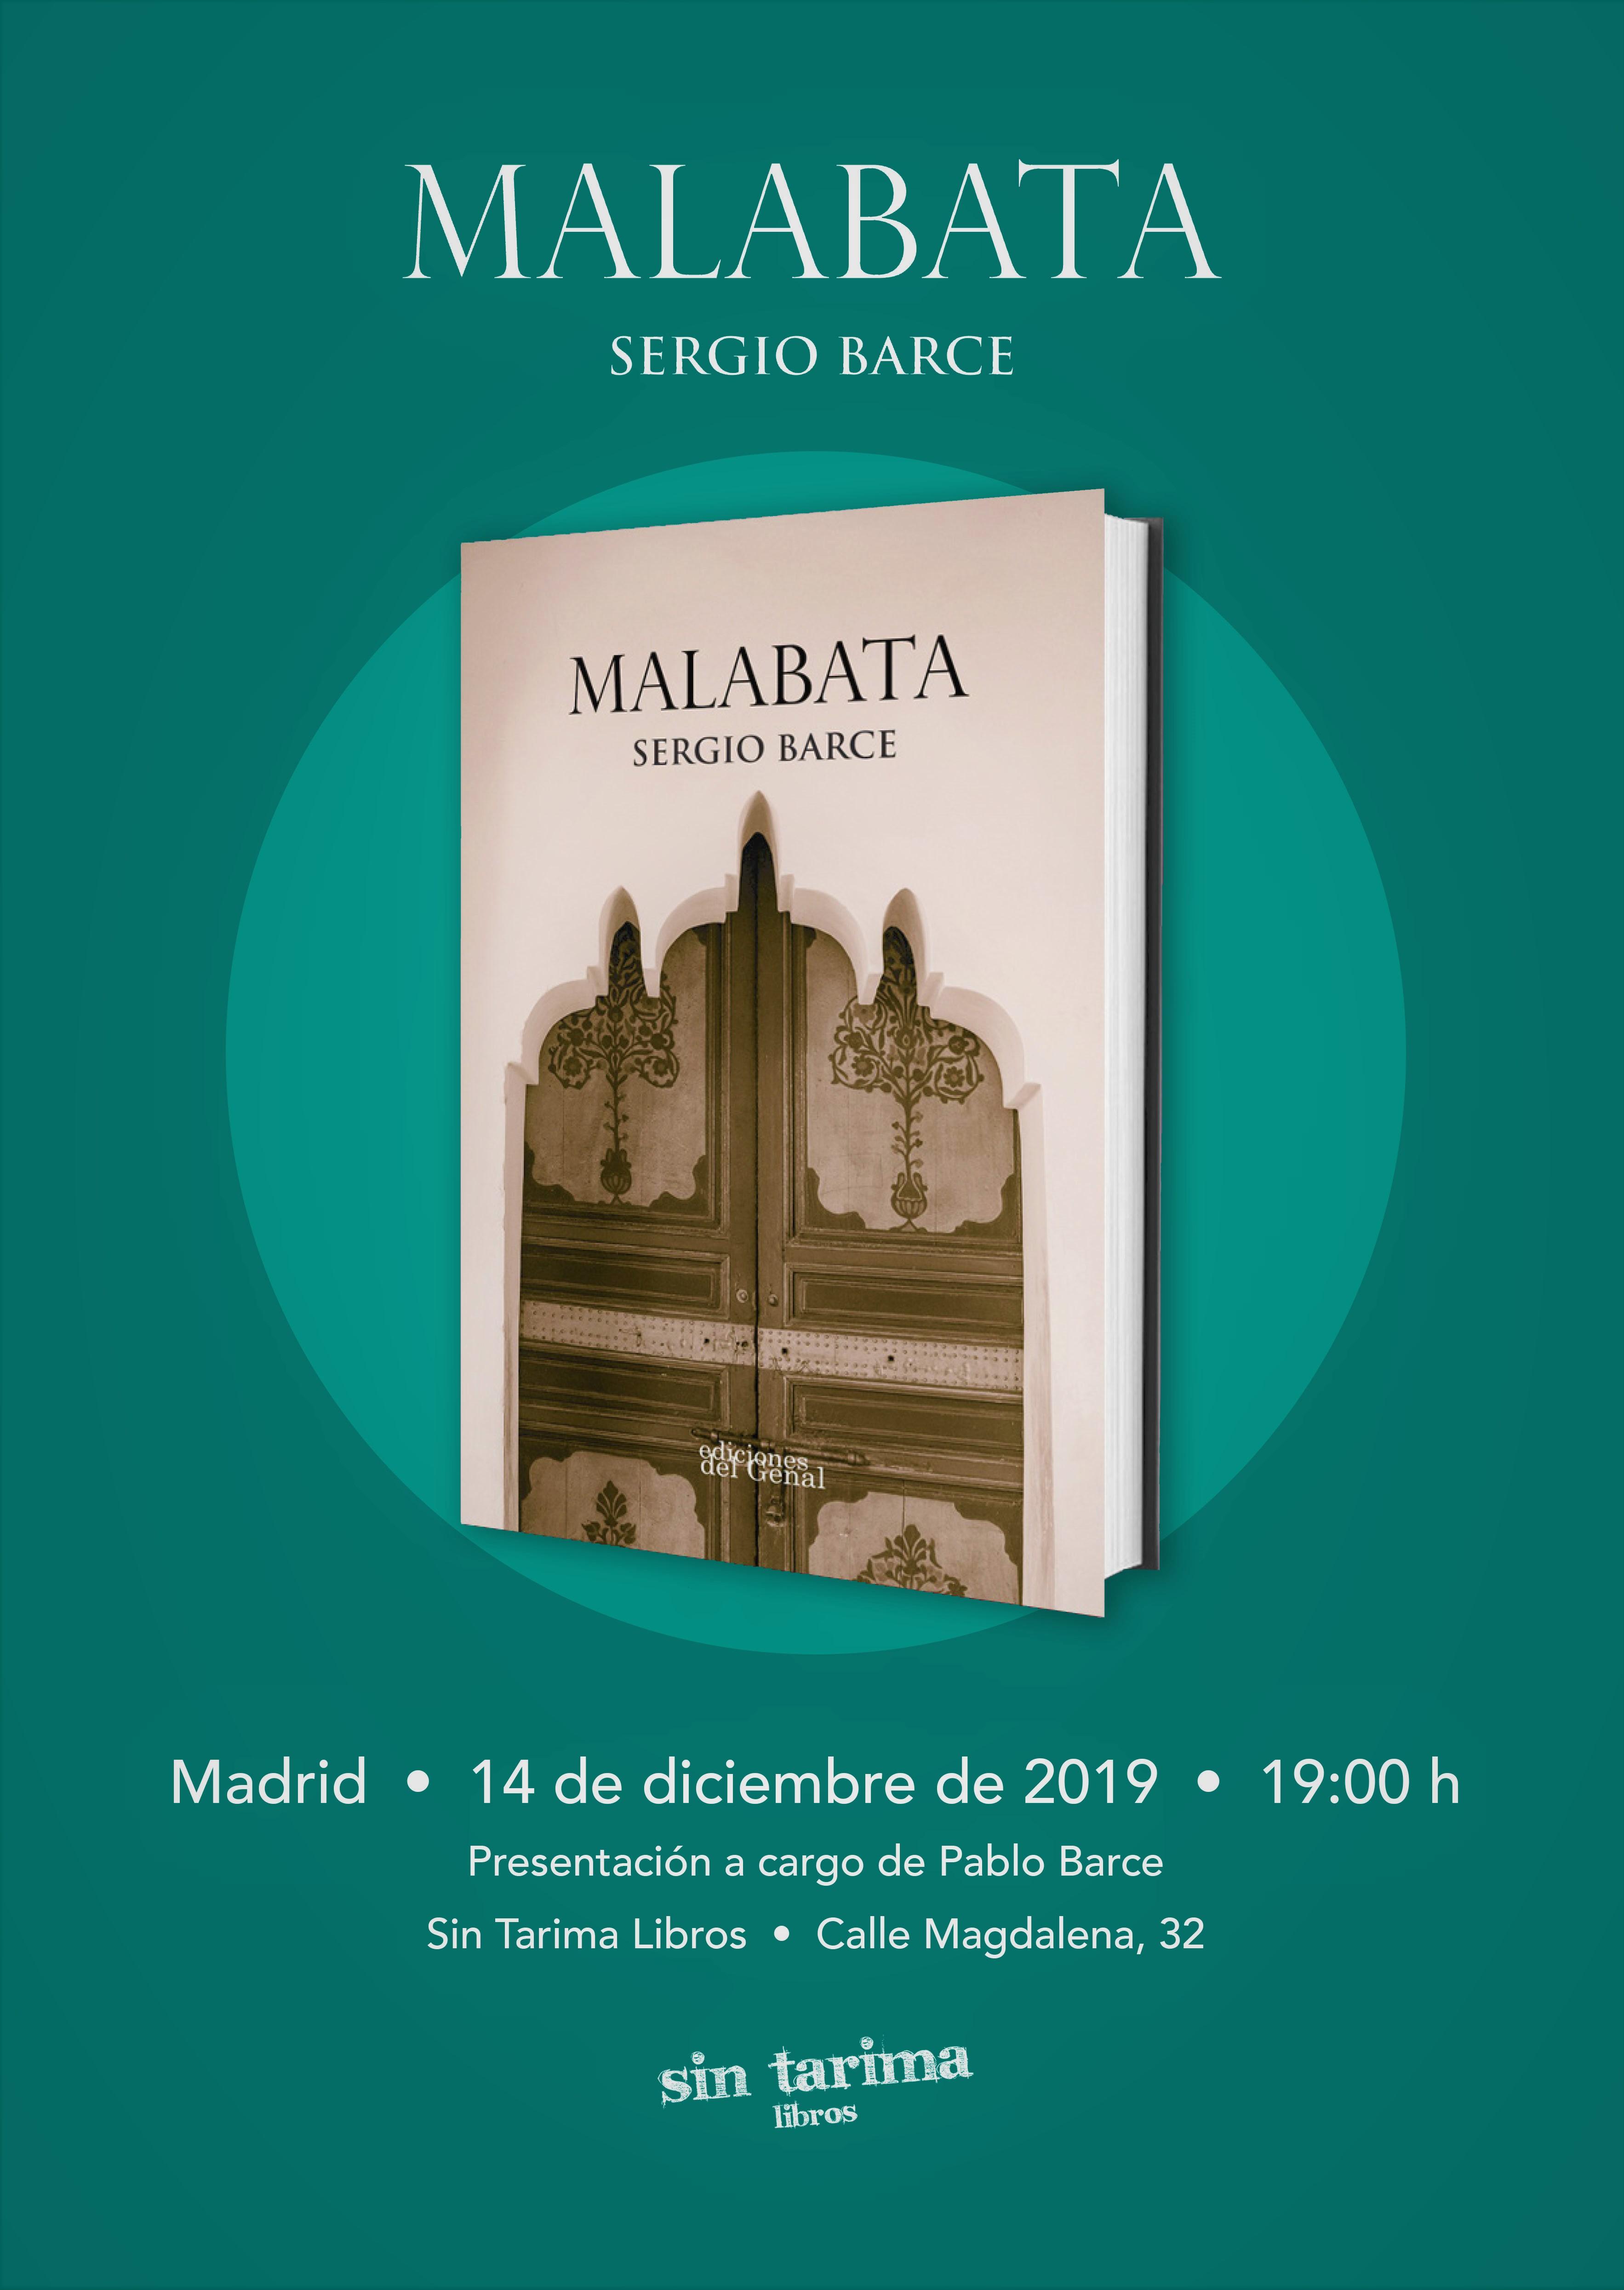 malabata_madrid pablo barce